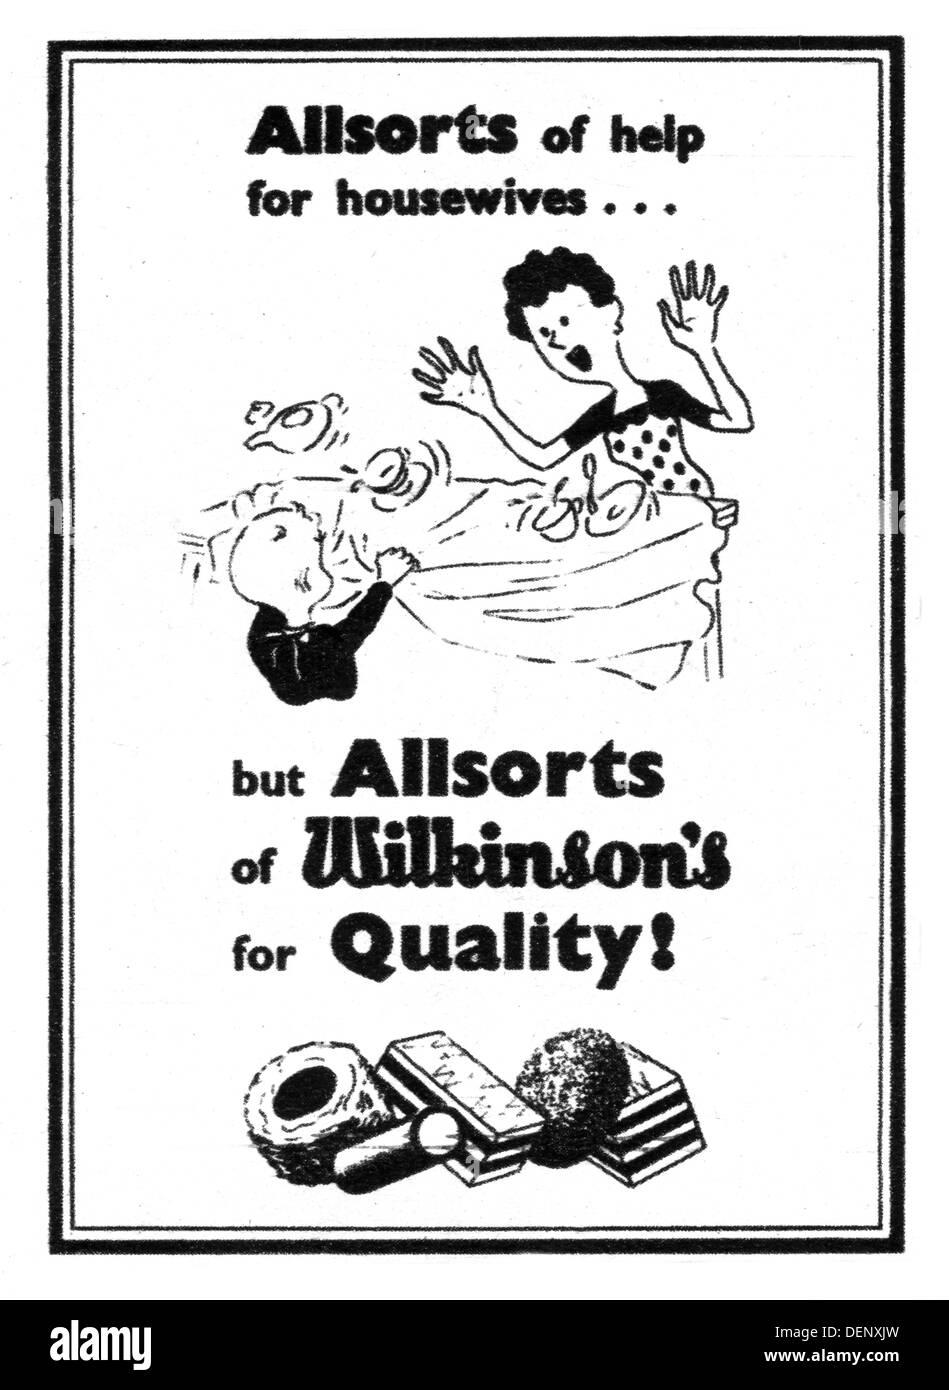 1953 advert for Wilkinson's / Bassett's liquorice Allsorts sweets now made by Cadbury brand owned by Mondelēz International Inc - Stock Image